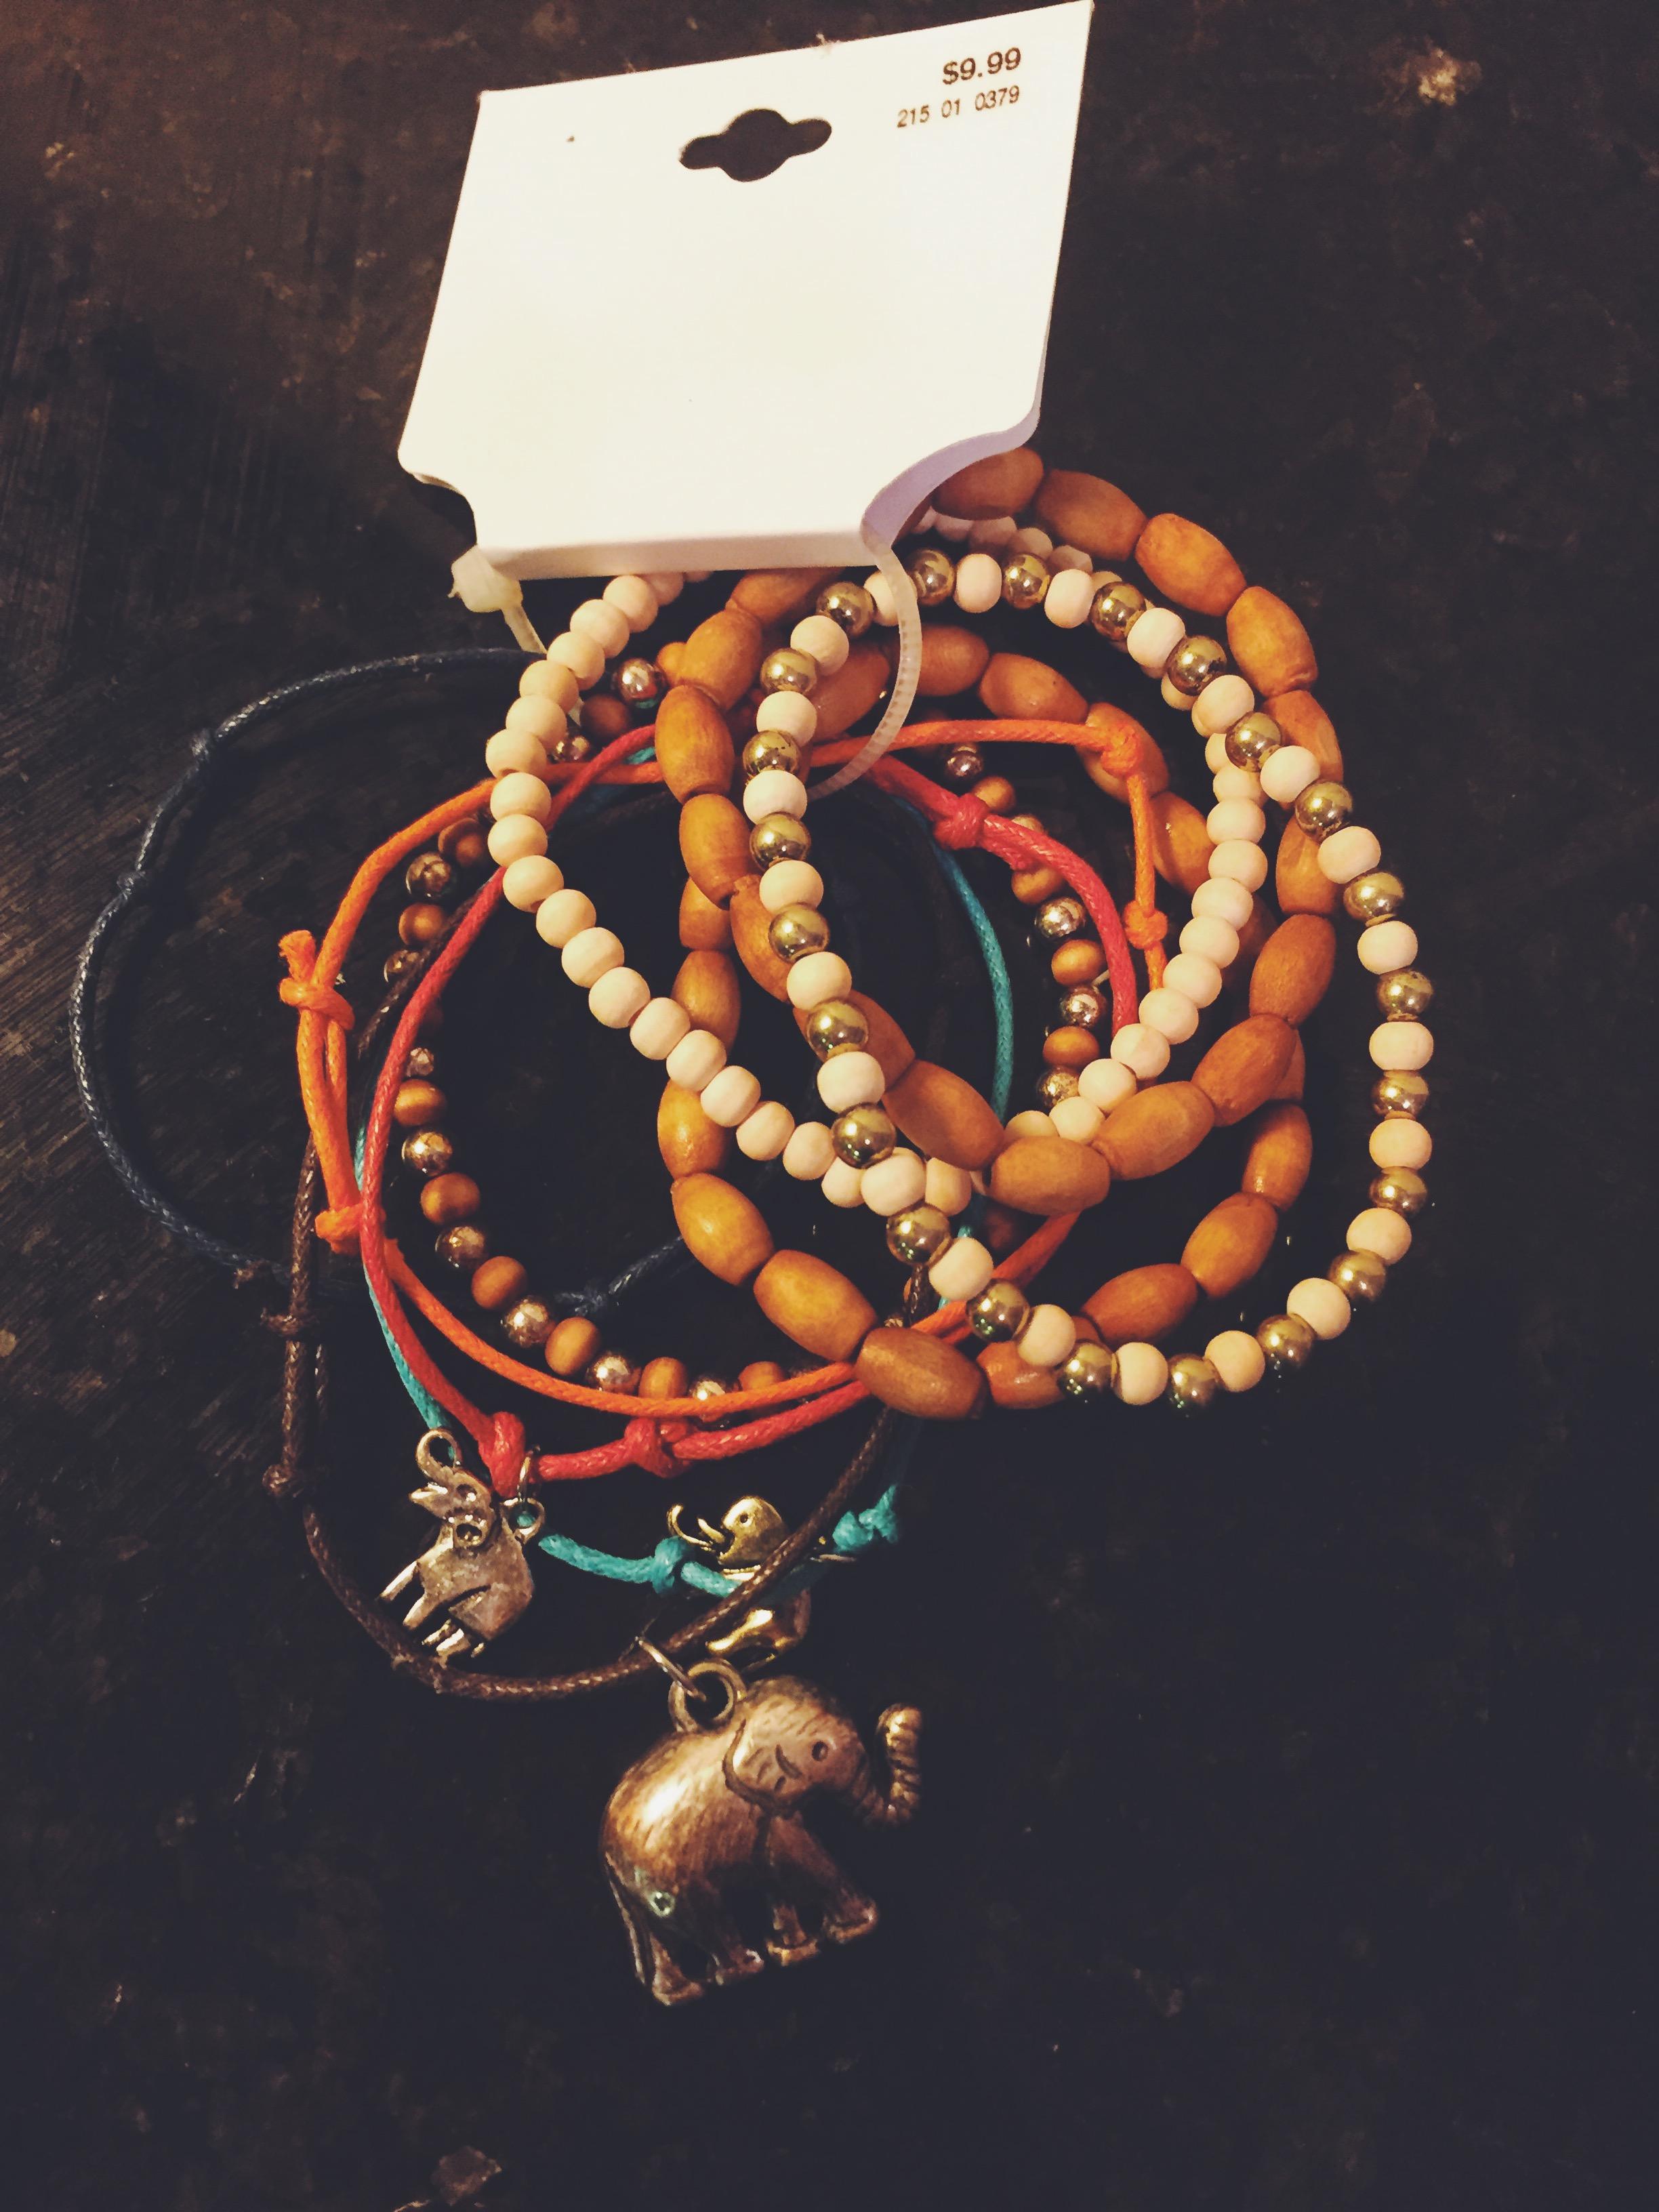 My bohemian ellie bracelet set. $9.99, Target